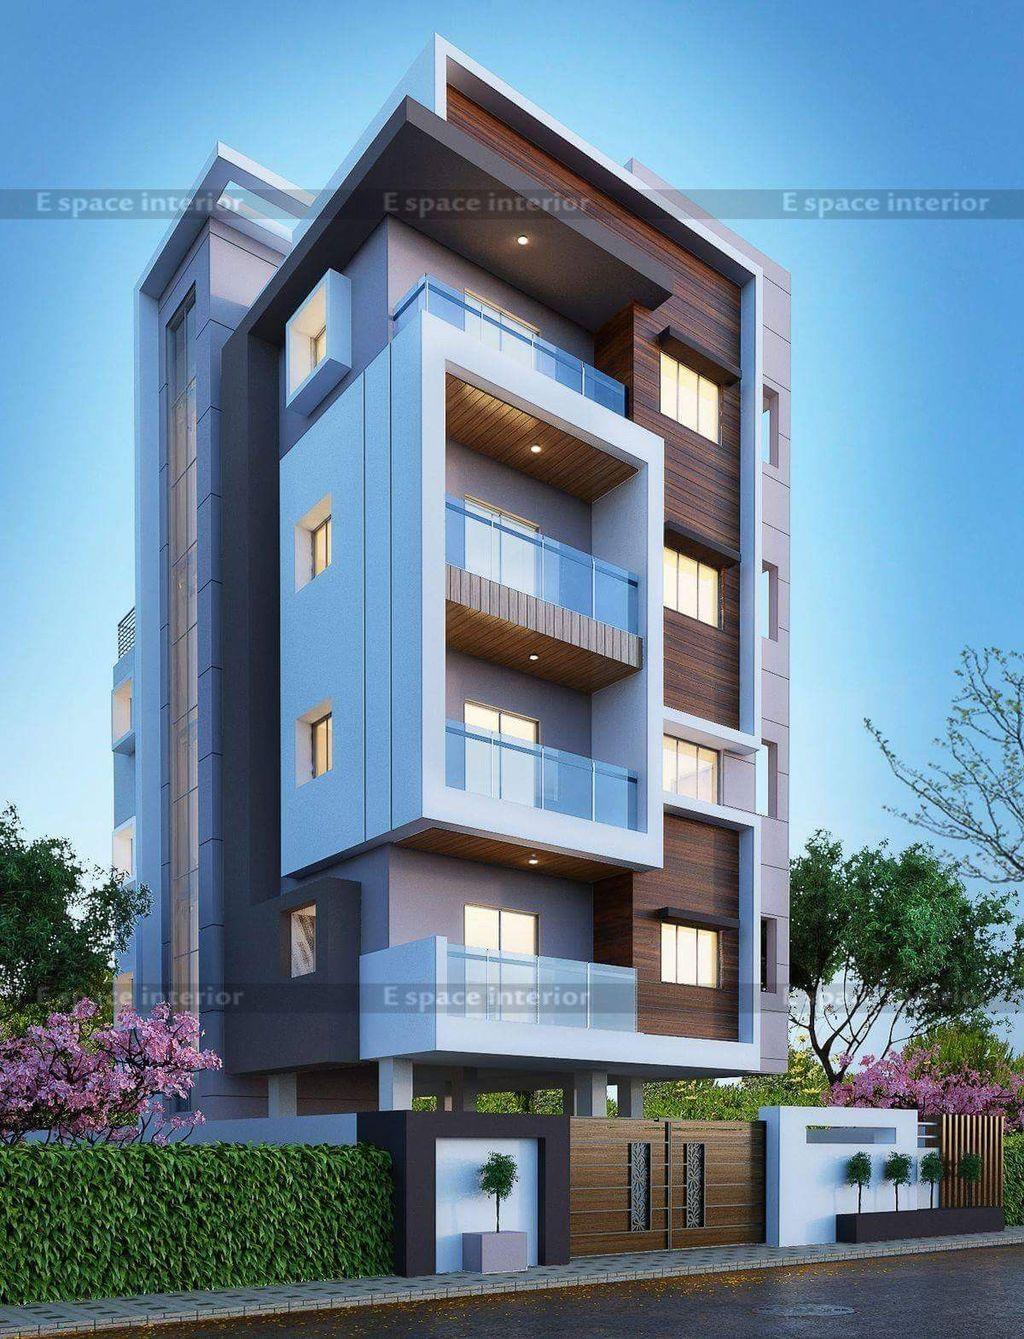 Cool 40 Amazing Apartment Building Facade Architecture Design More At Https Homishome Com 2018 09 15 40 Amazing Apartment Build House Kiến Truc Kiến Truc Sư